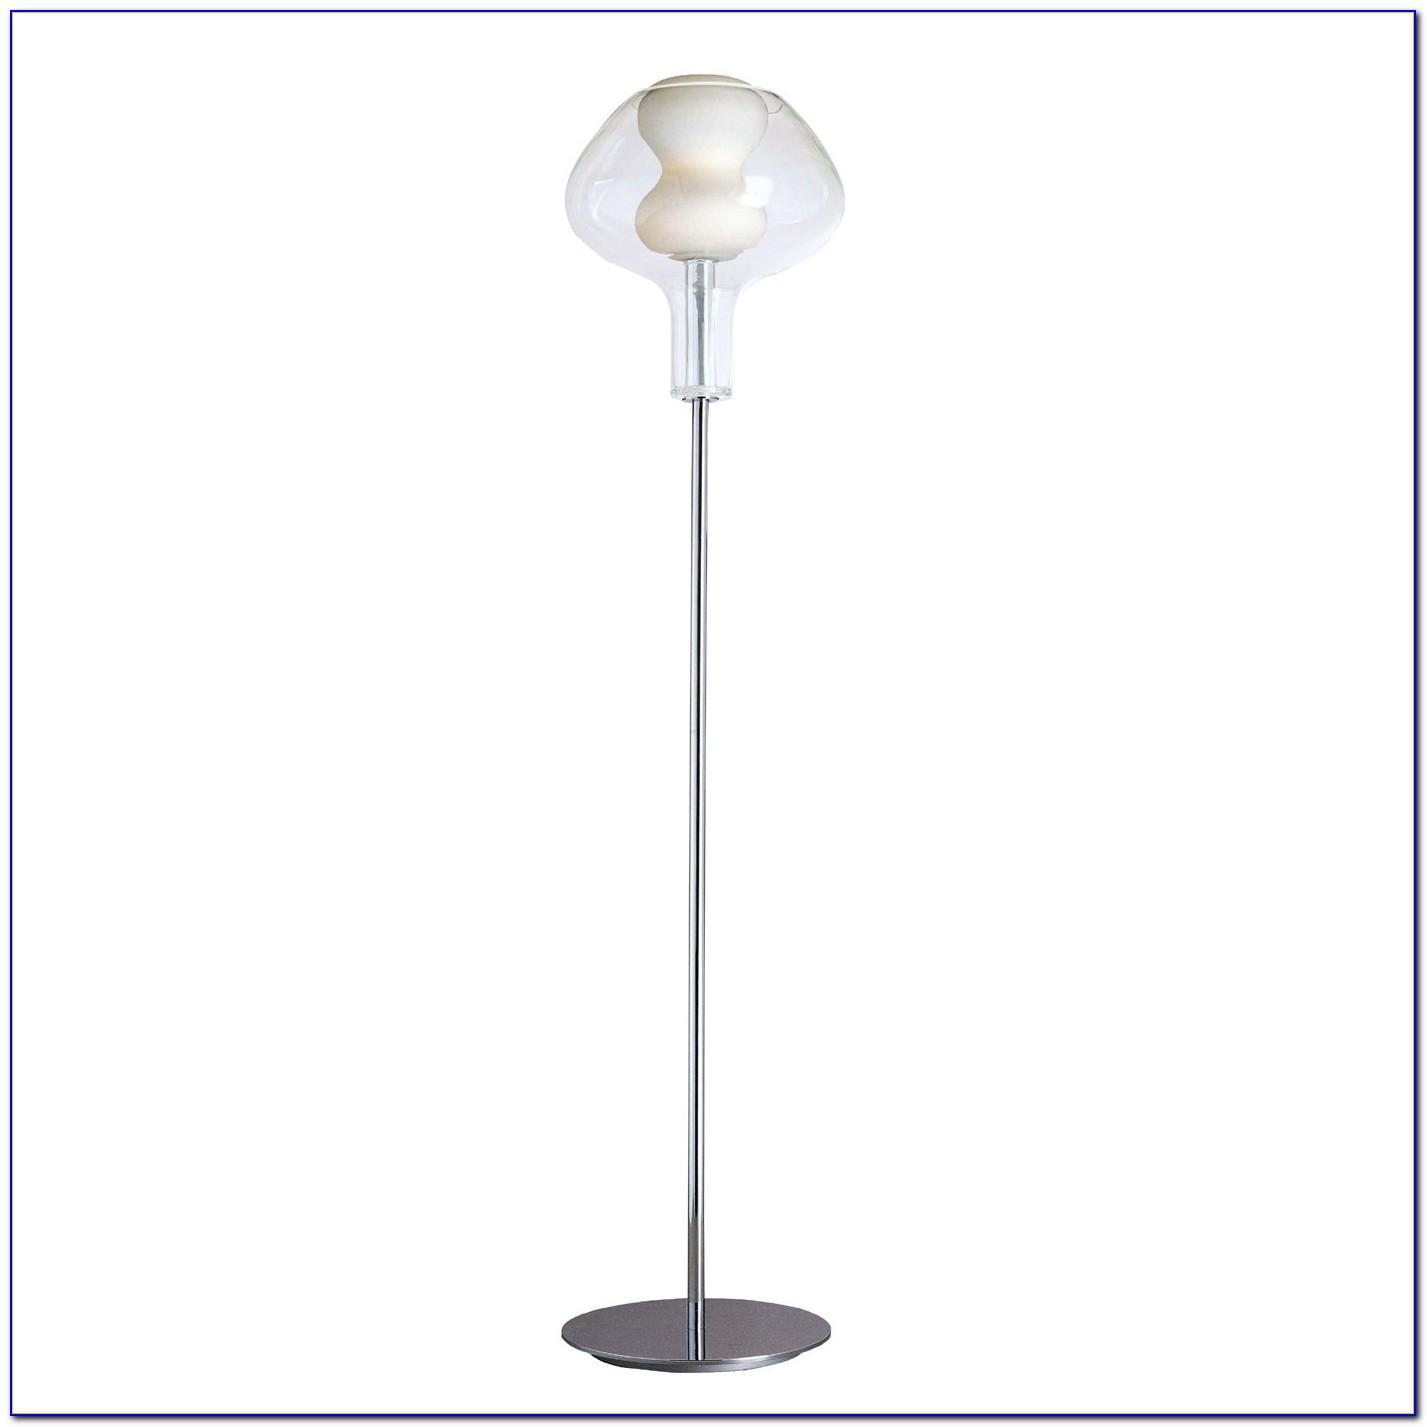 Minka Aire Cirque George Kovacs Ceiling Fan